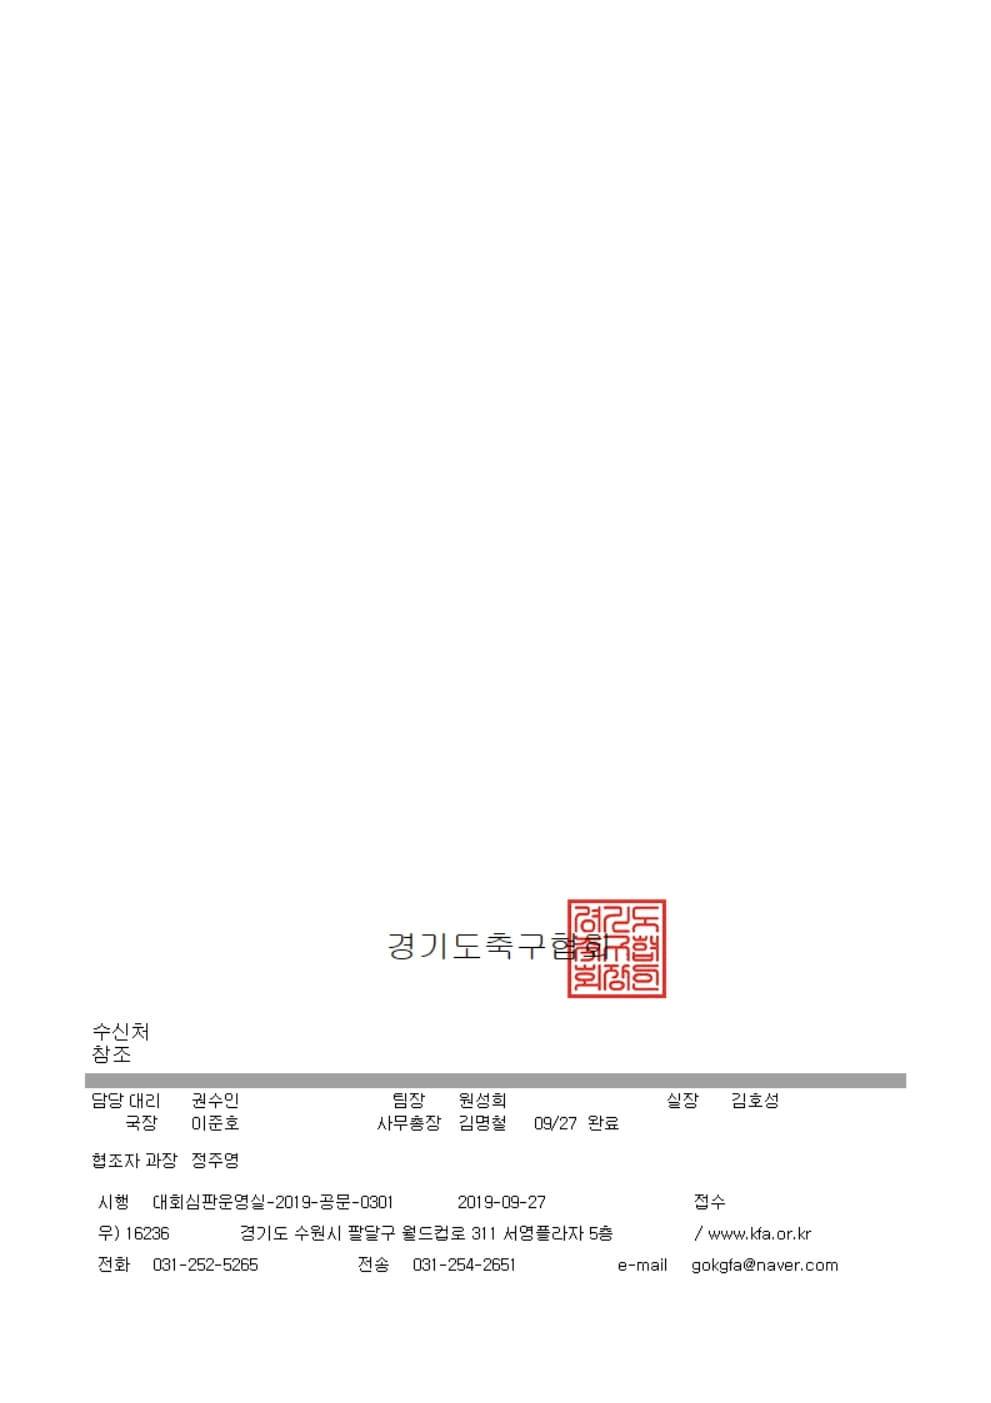 a80d128767bd734325078b759964ed18_1569565743_3244.jpg